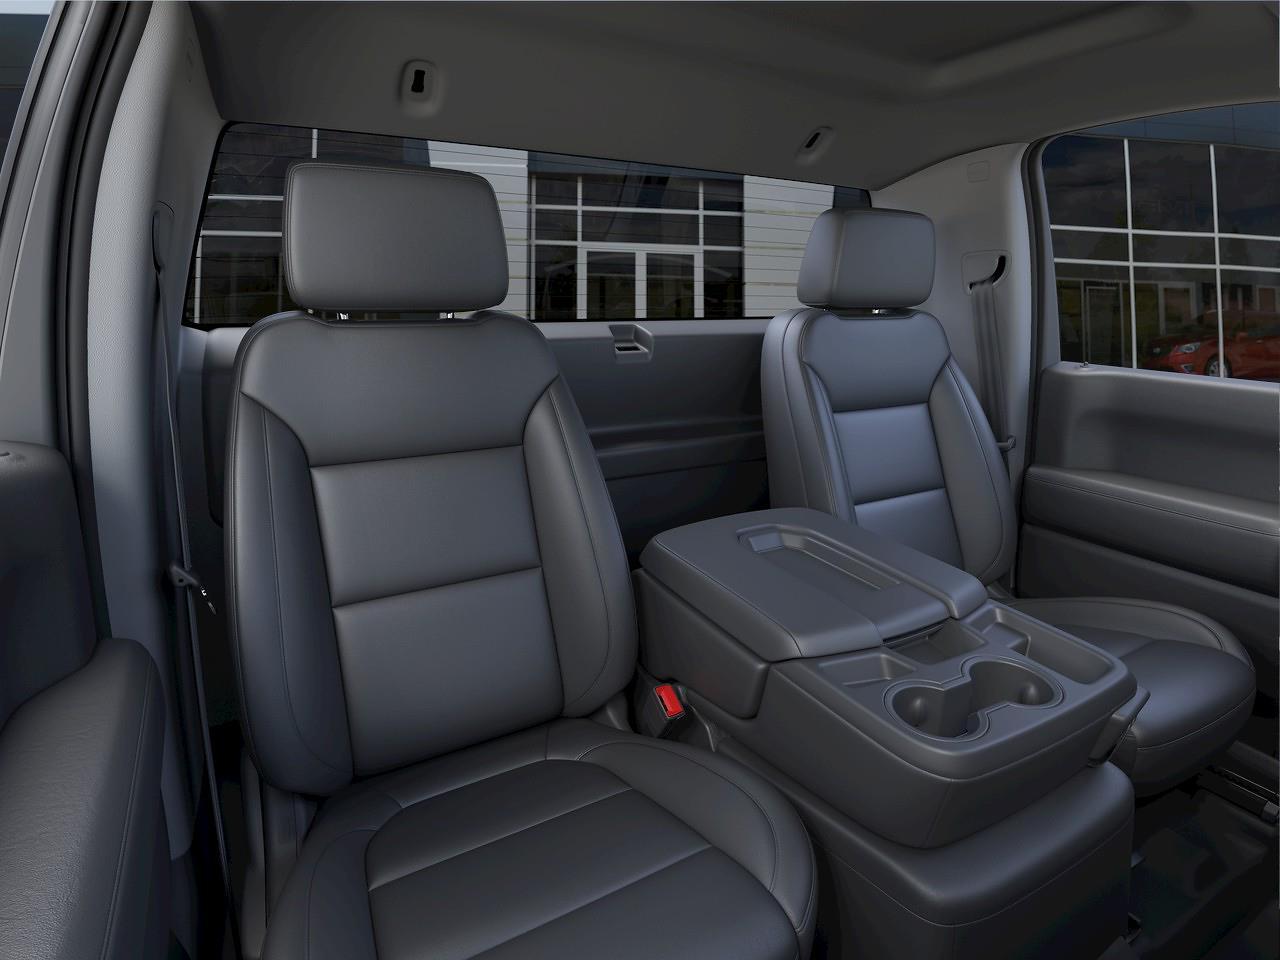 2021 GMC Sierra 1500 Regular Cab 4x4, Pickup #389460 - photo 13